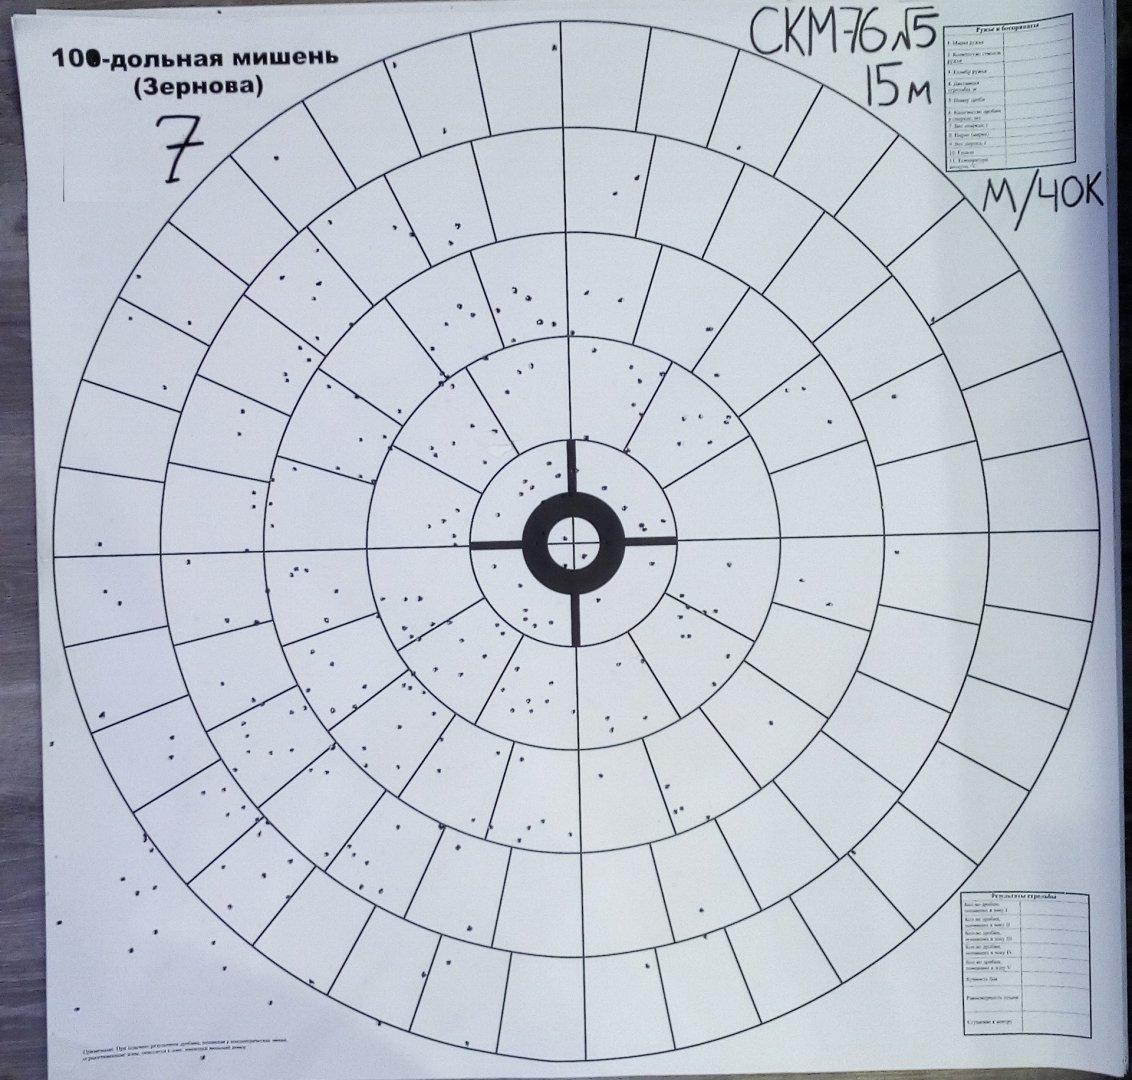 15м чок СКМ76 5.jpg